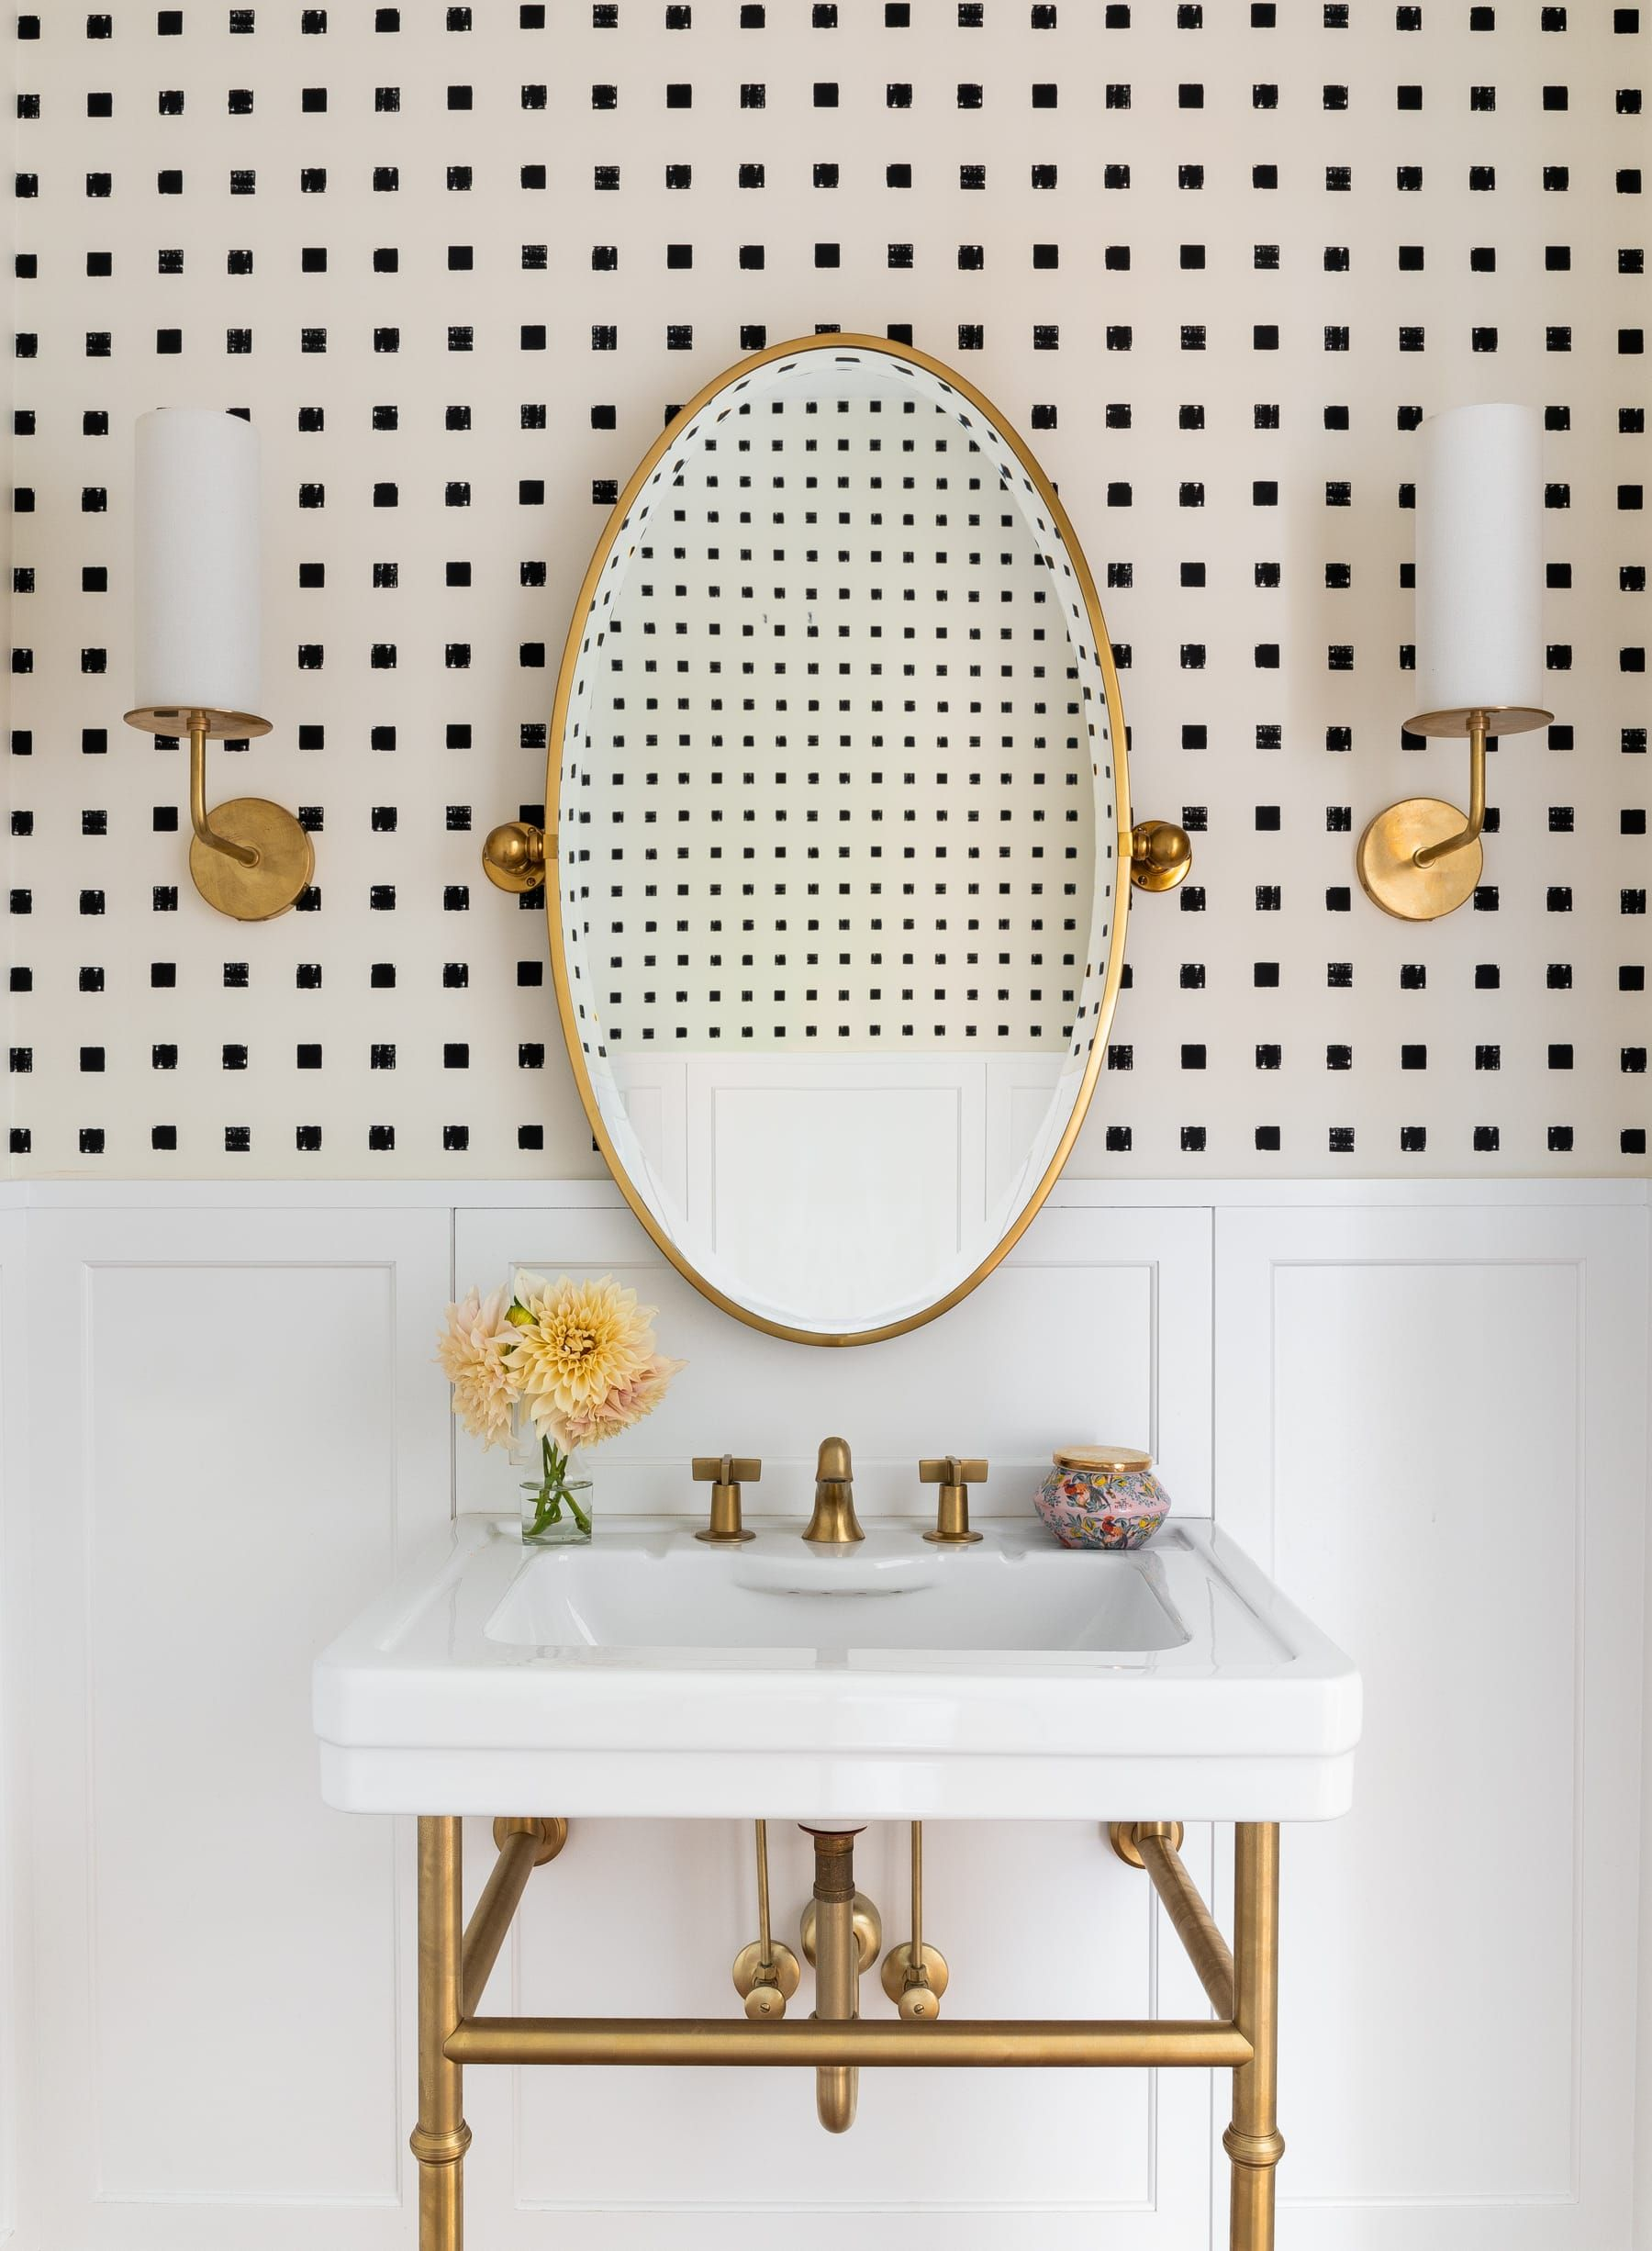 Chic Bathroom Ideas To Redesign Your Space Chic Bathrooms Residential Interior Design Bathroom Interior